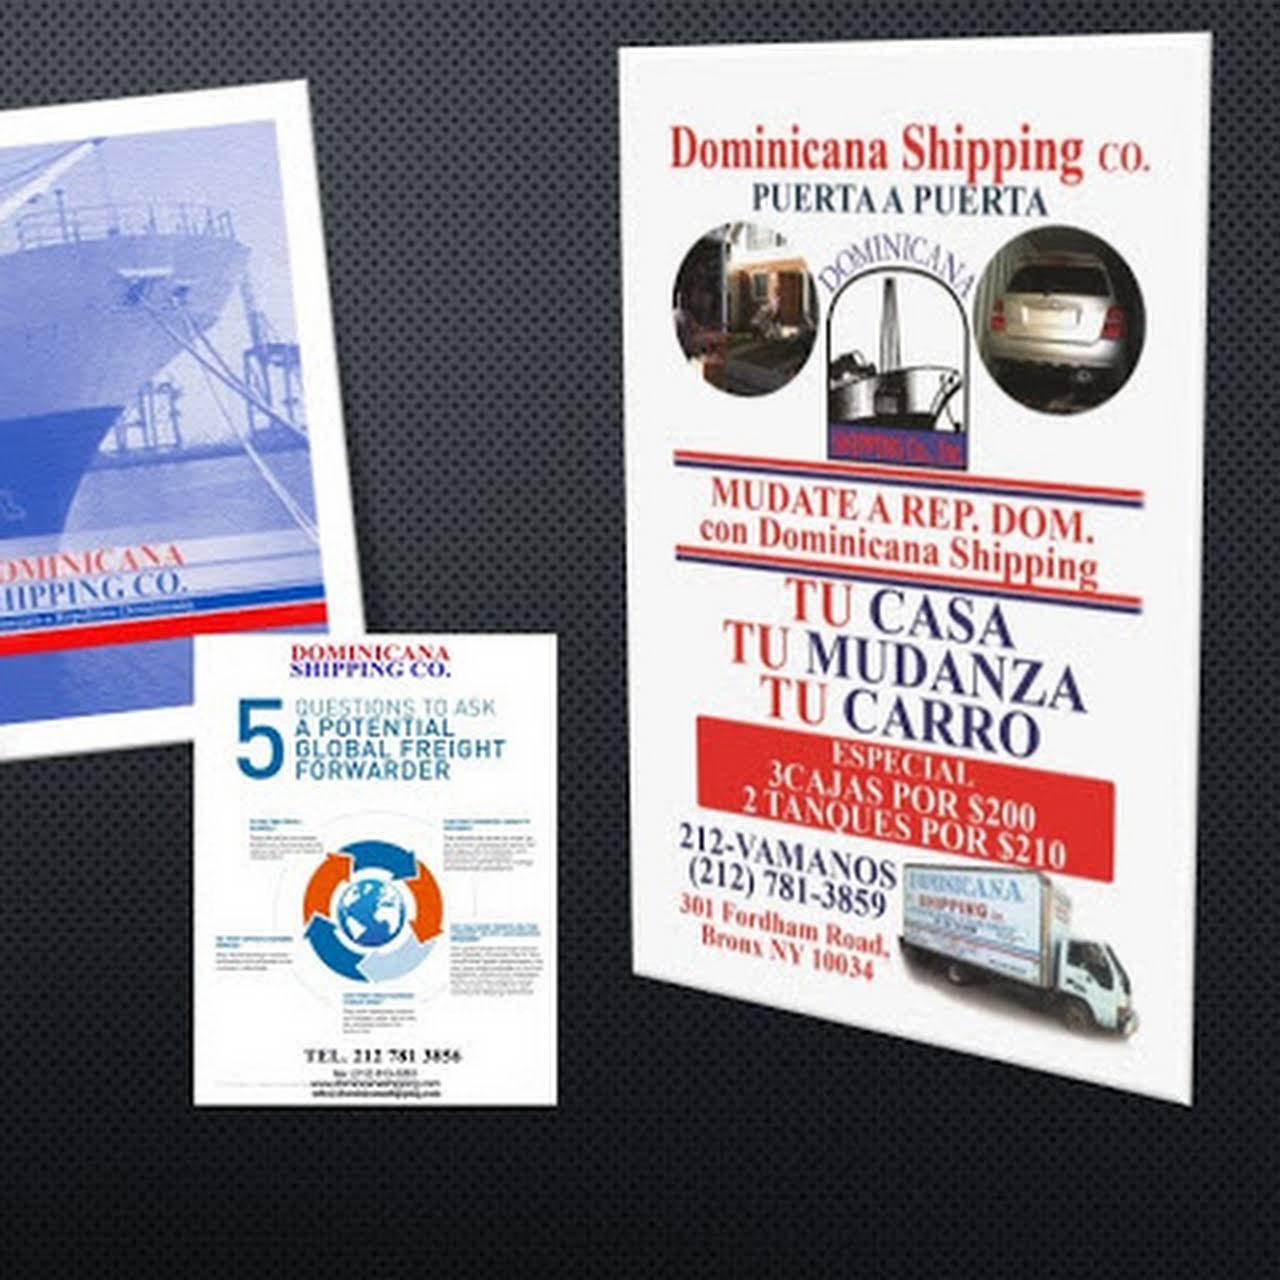 vânzare online imagini oficiale magazin de vânzare Dominicana Shipping - General Cargo & Shipping Company